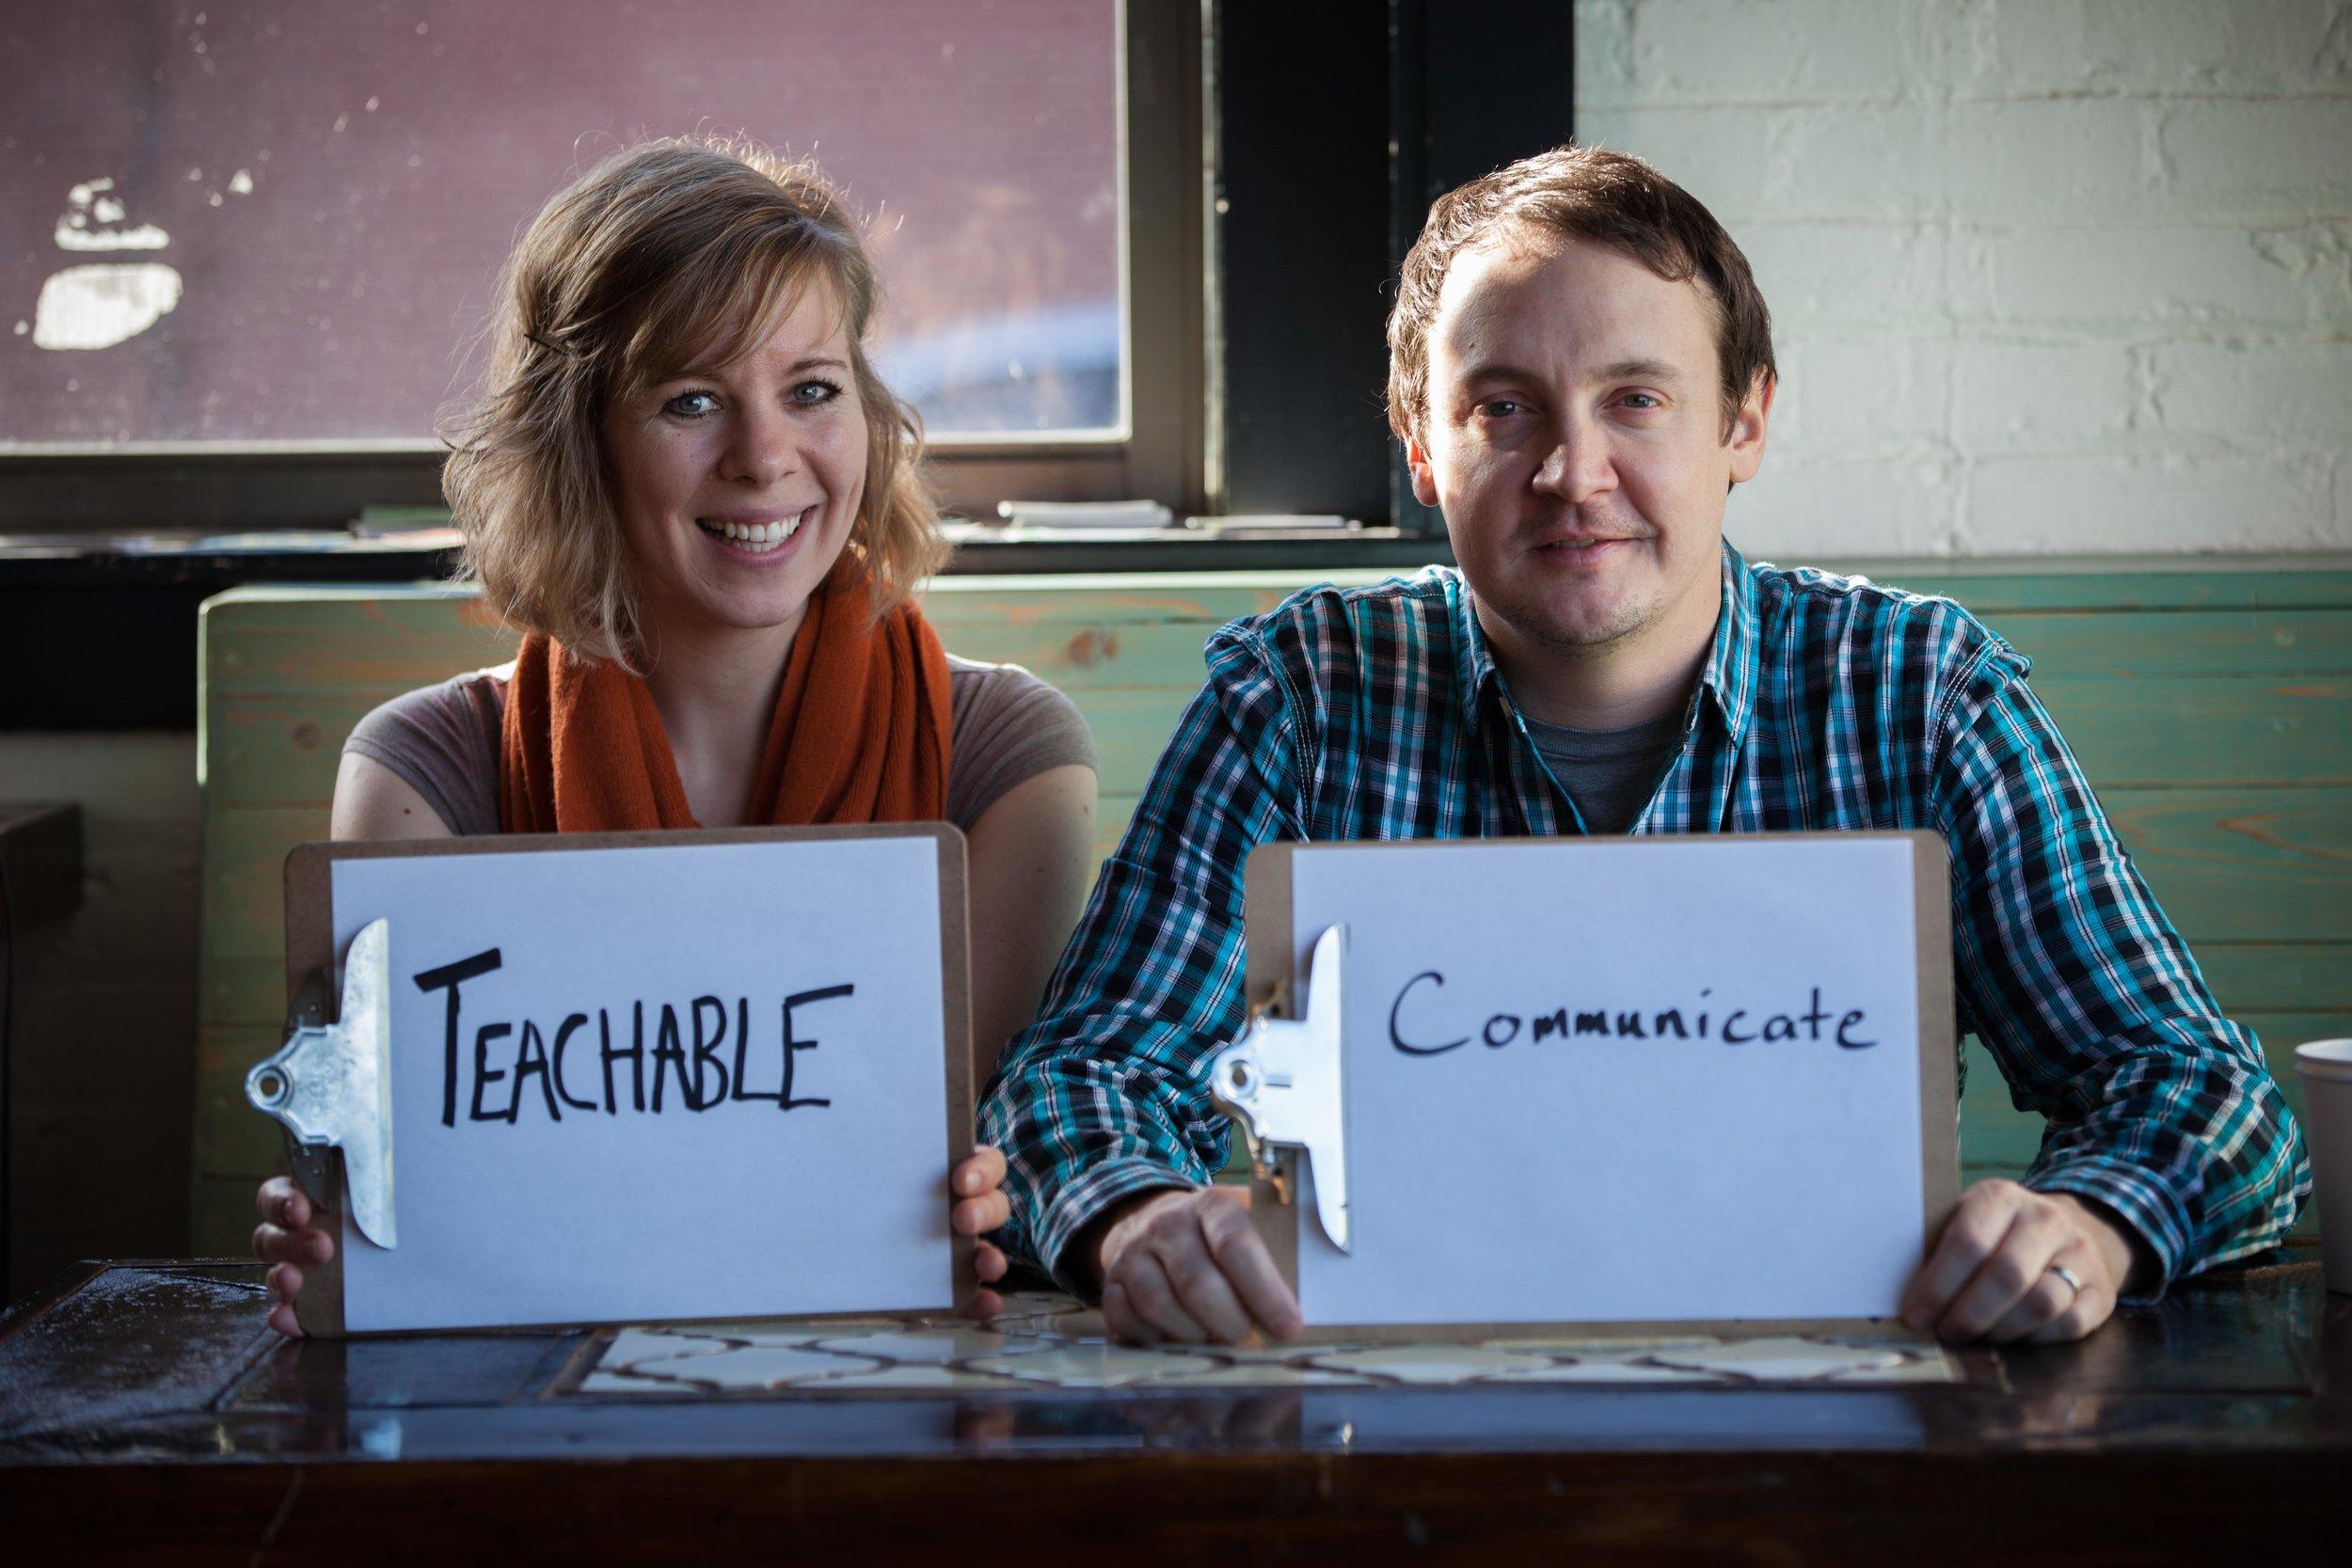 Teachable & Communicate